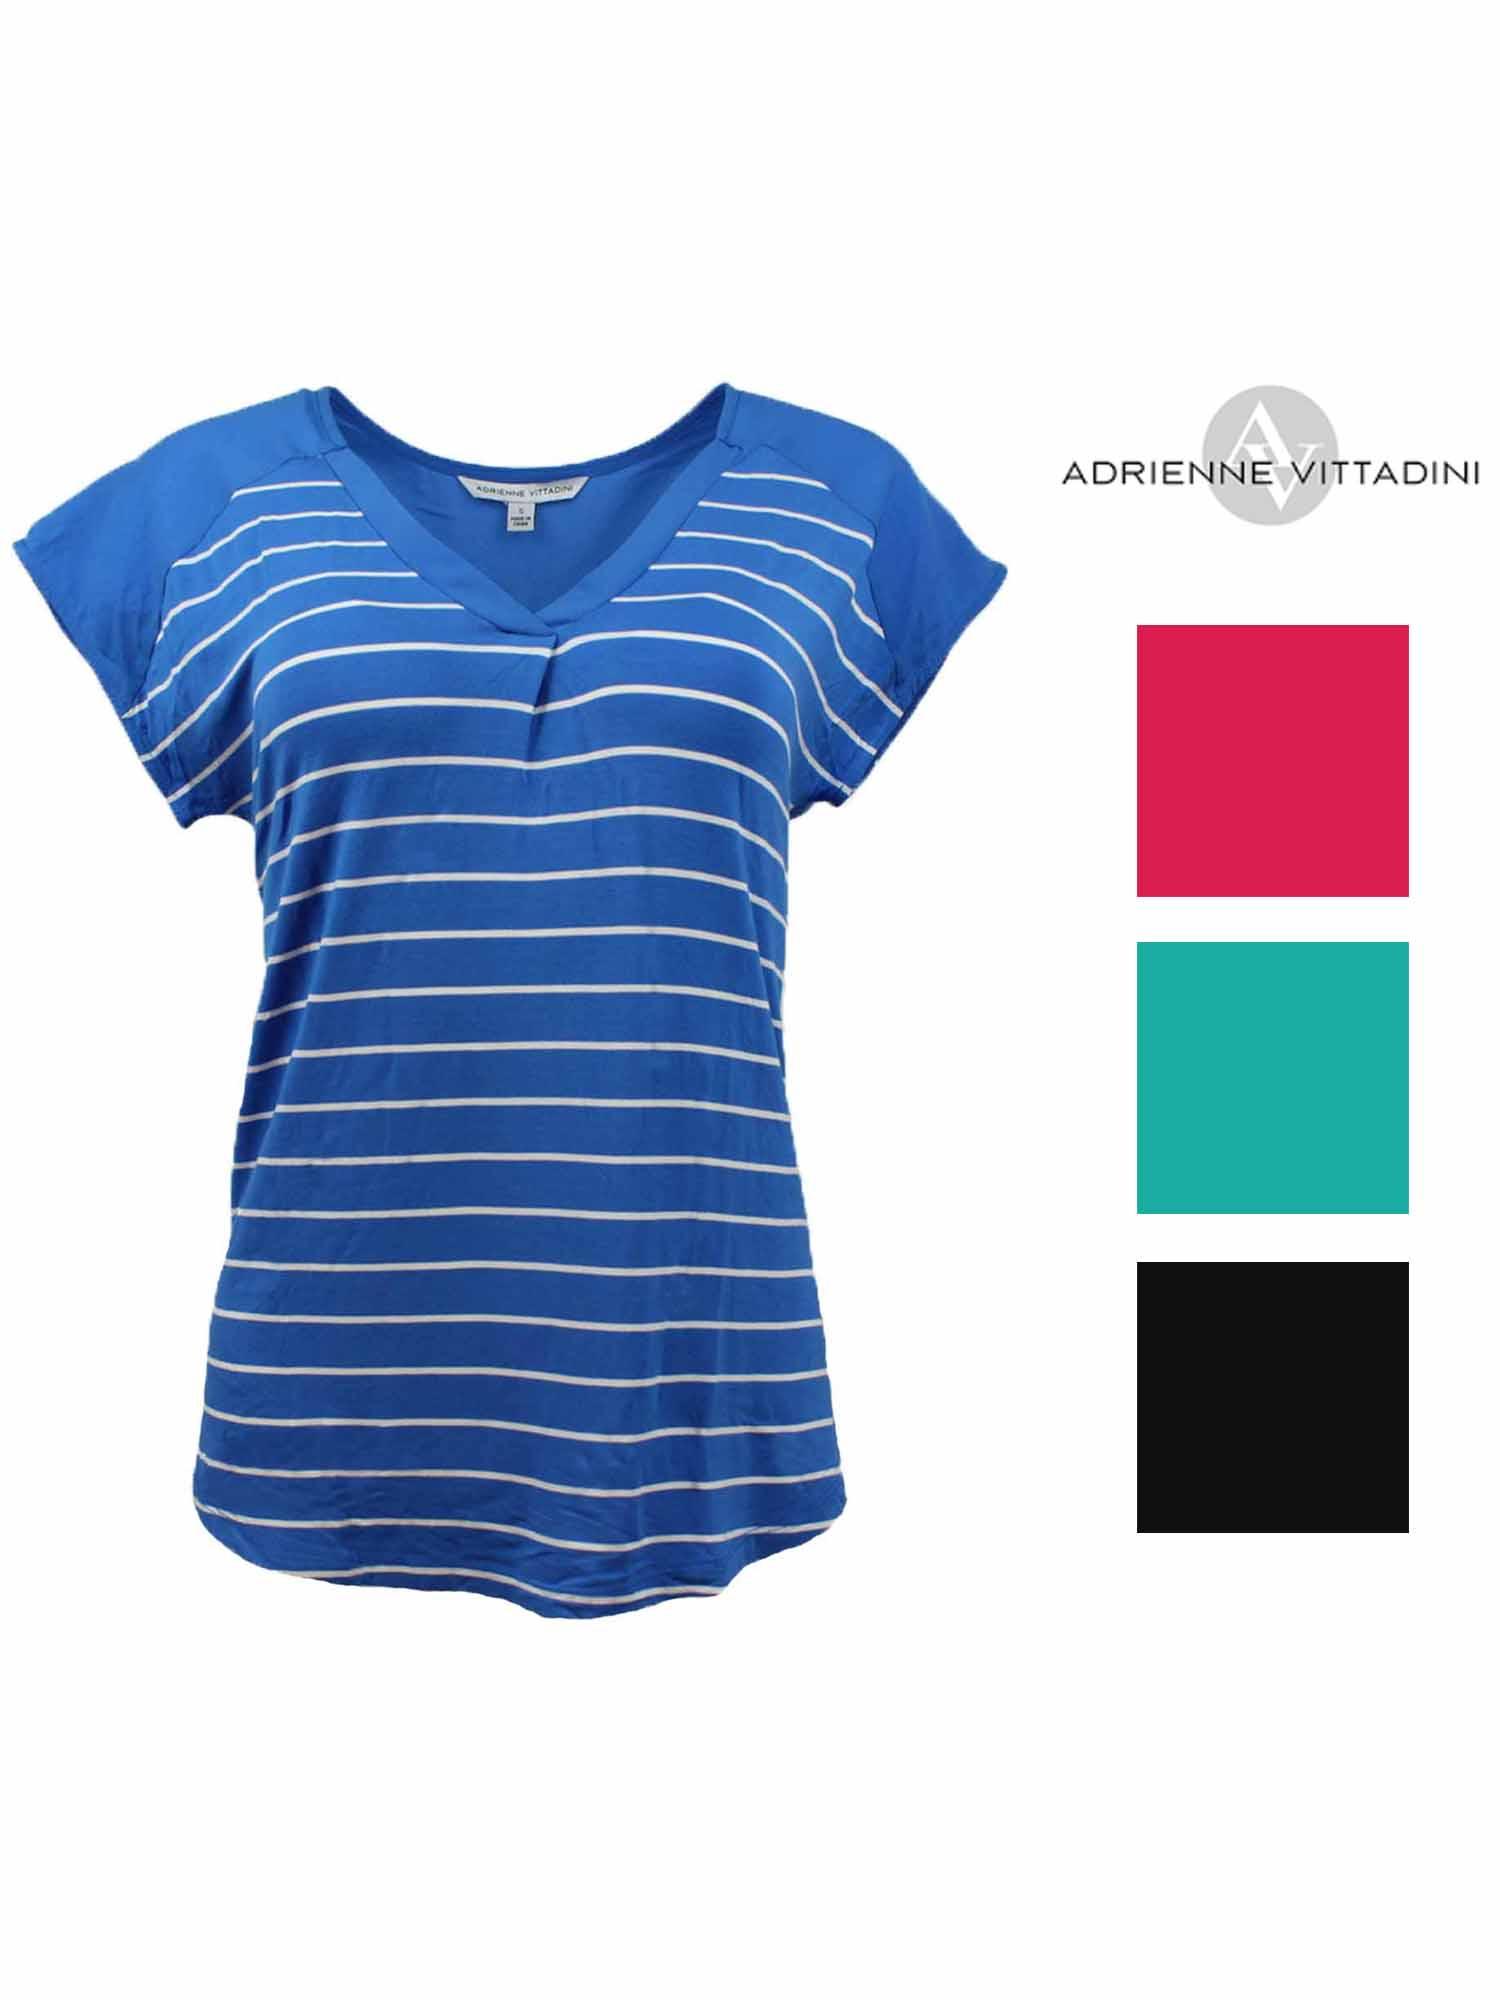 Adrienne Vittadini Women/'s V-Neck Blouse Pacific Stripe US Size L NWT